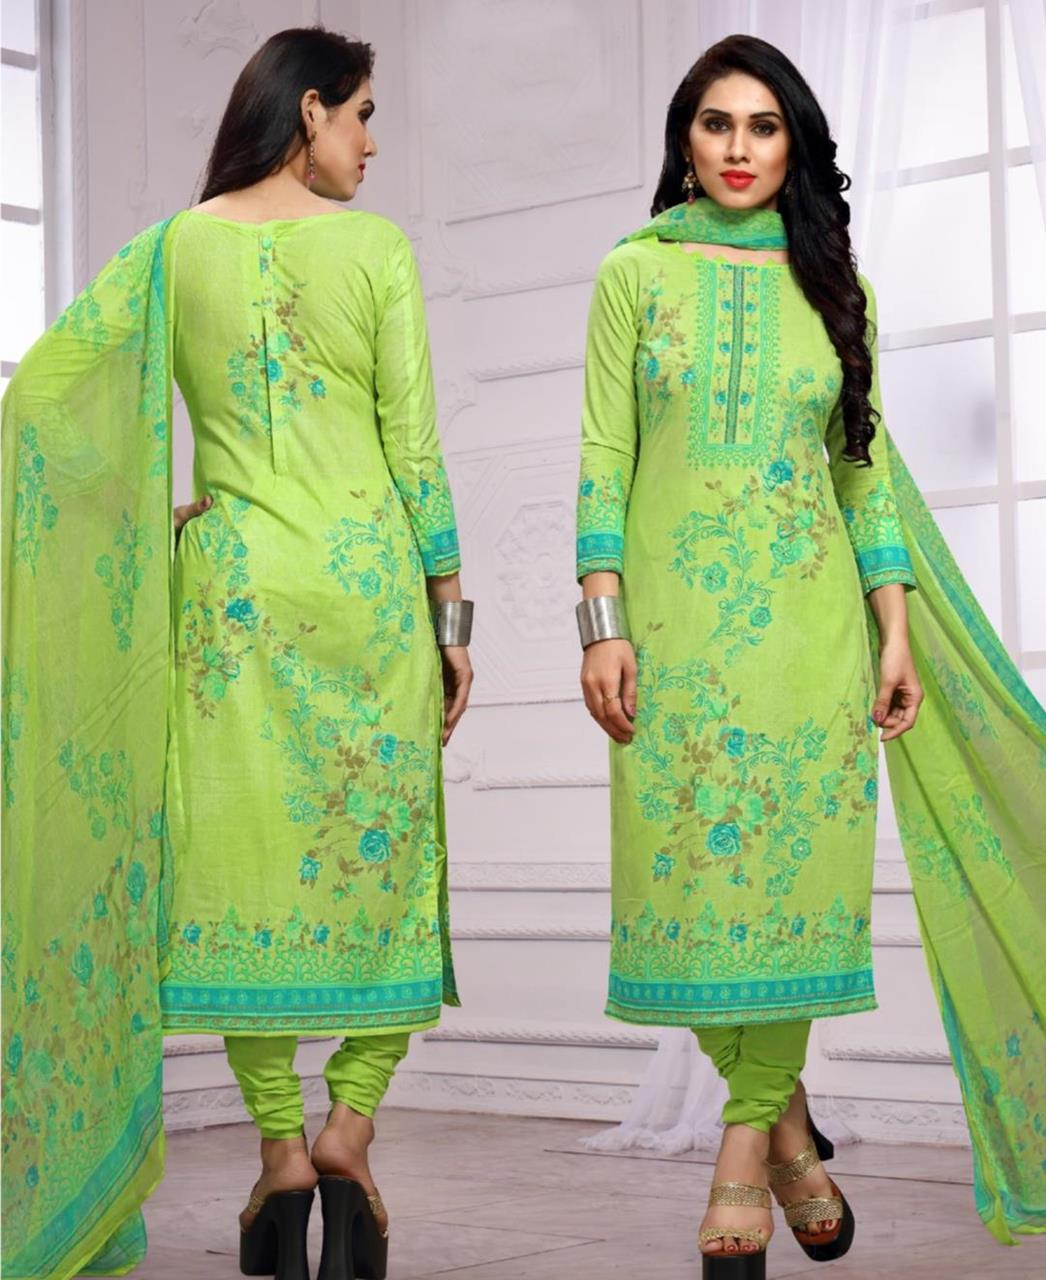 Printed Cotton LimeGreen Straight Cut Salwar